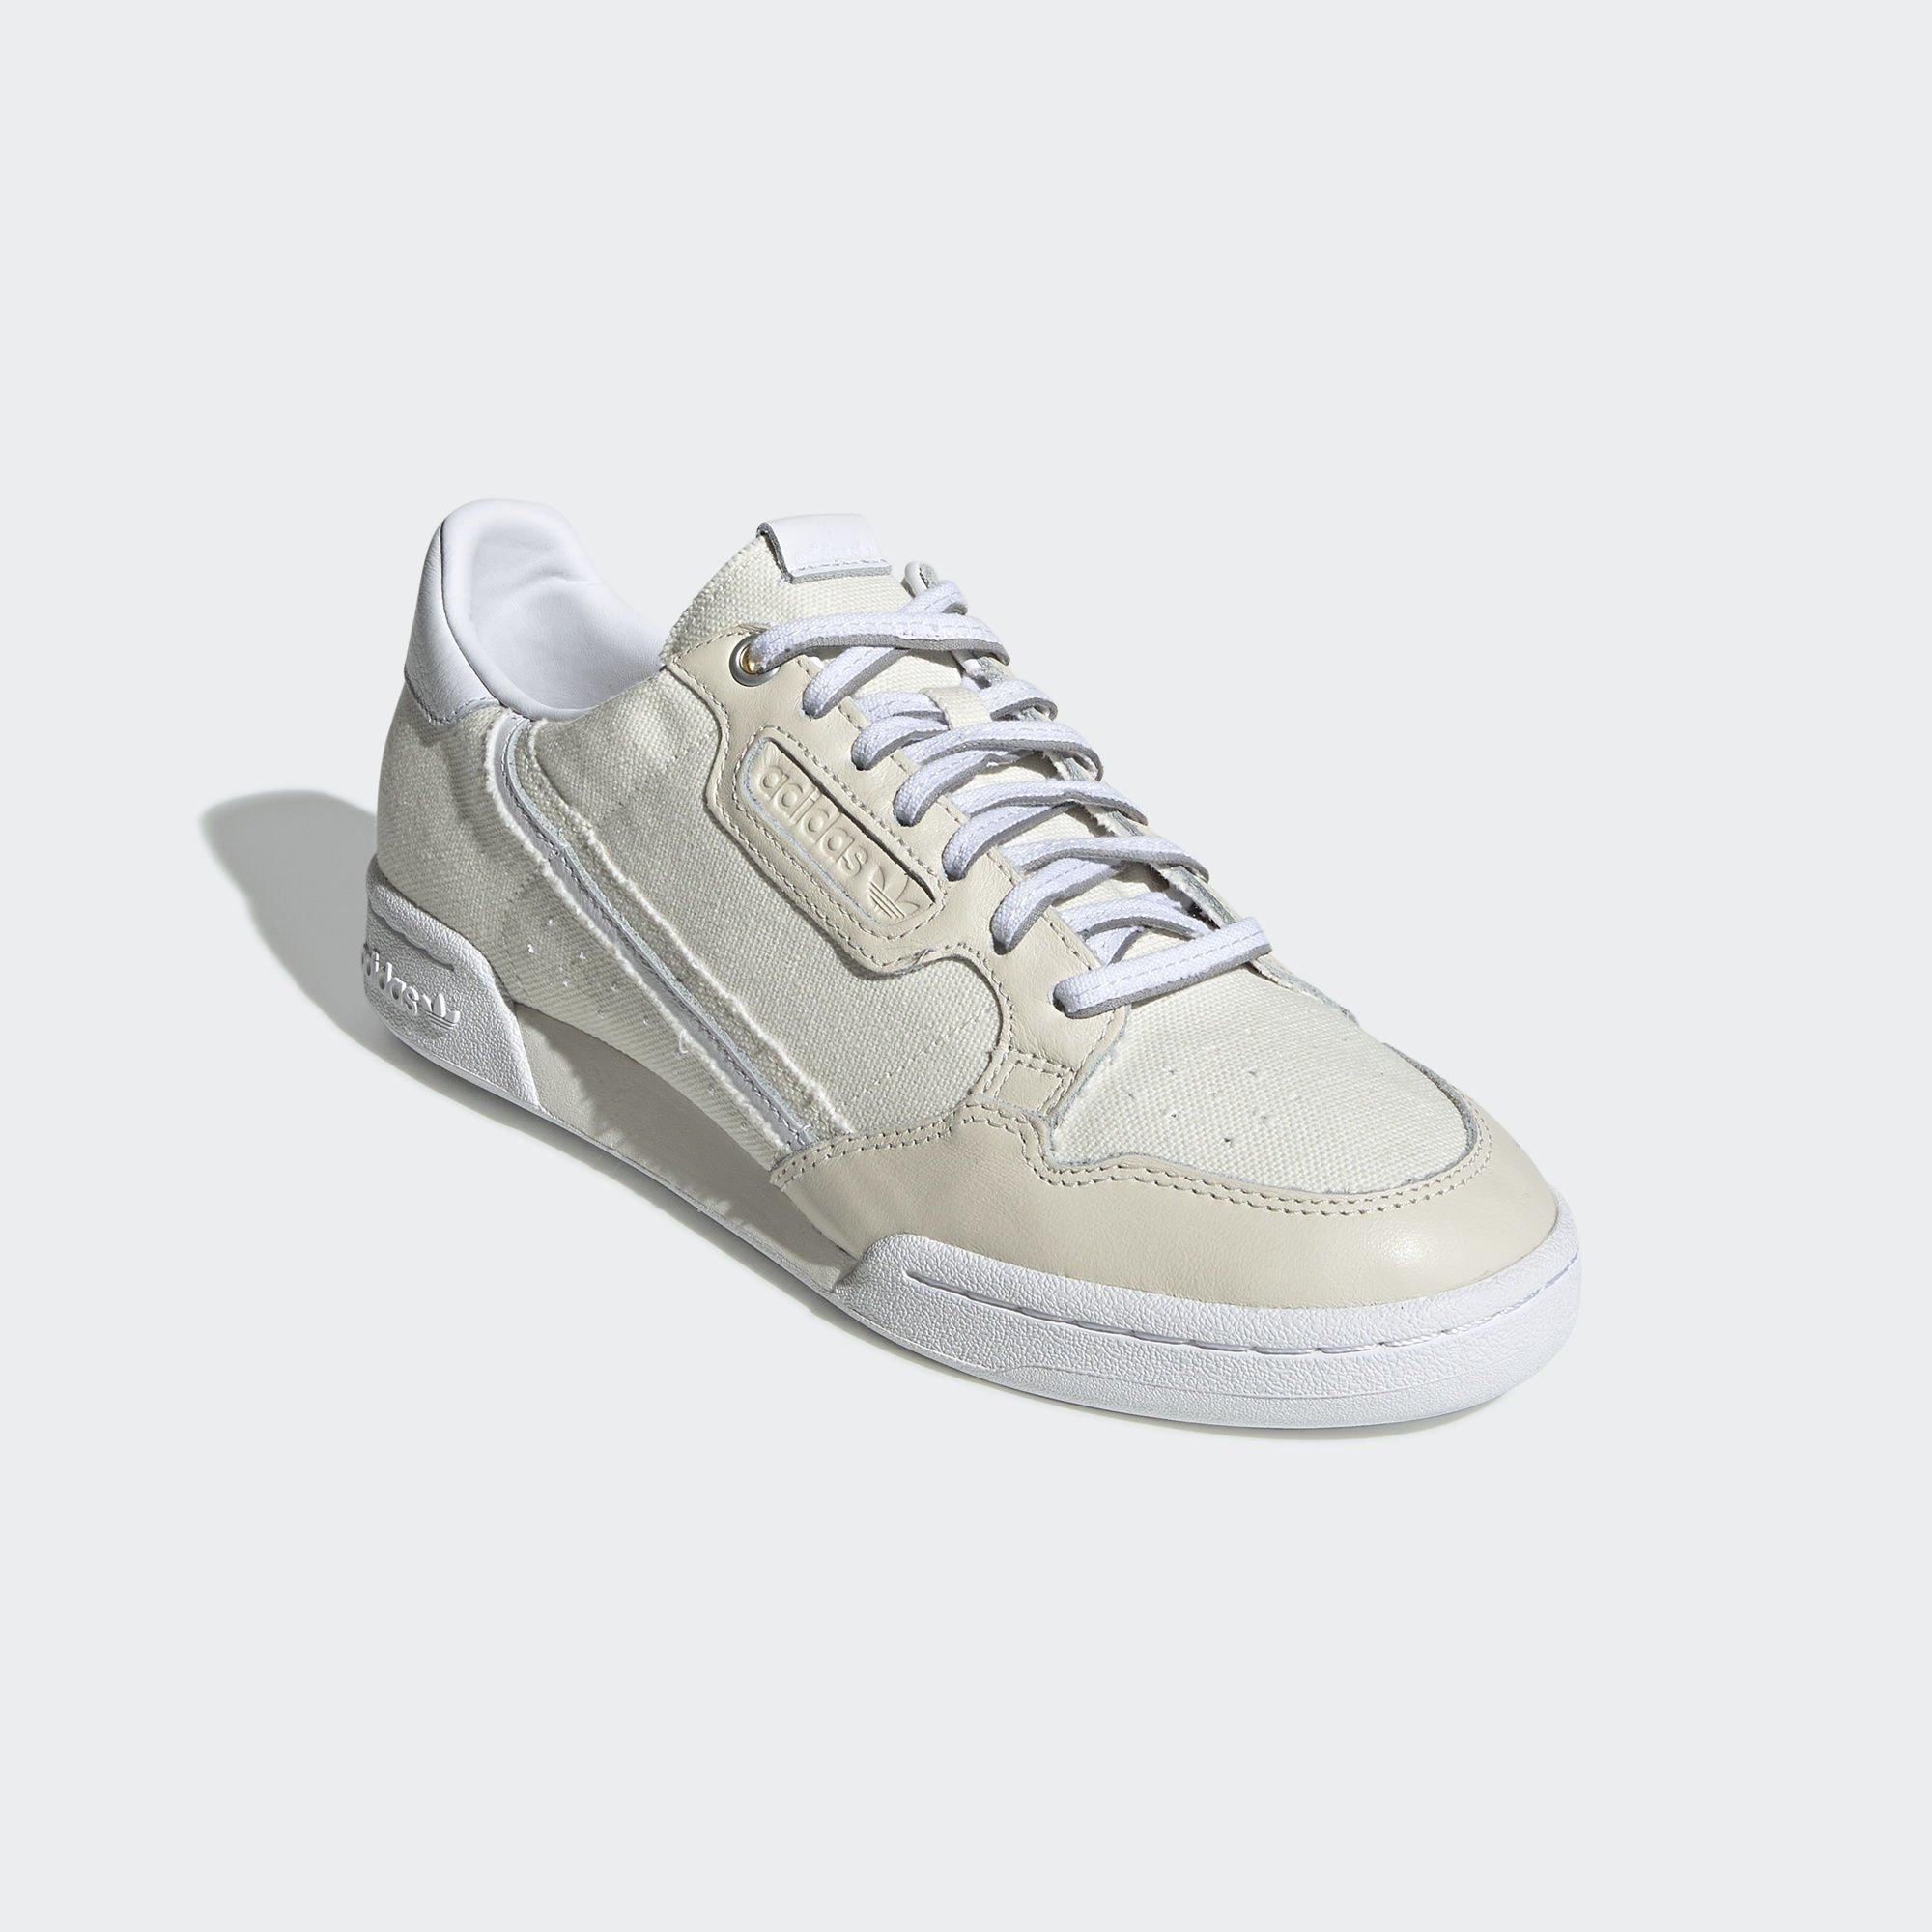 Adidas Continental 80 DG Off White / Craft Pink / Ftwr White (EG1760)